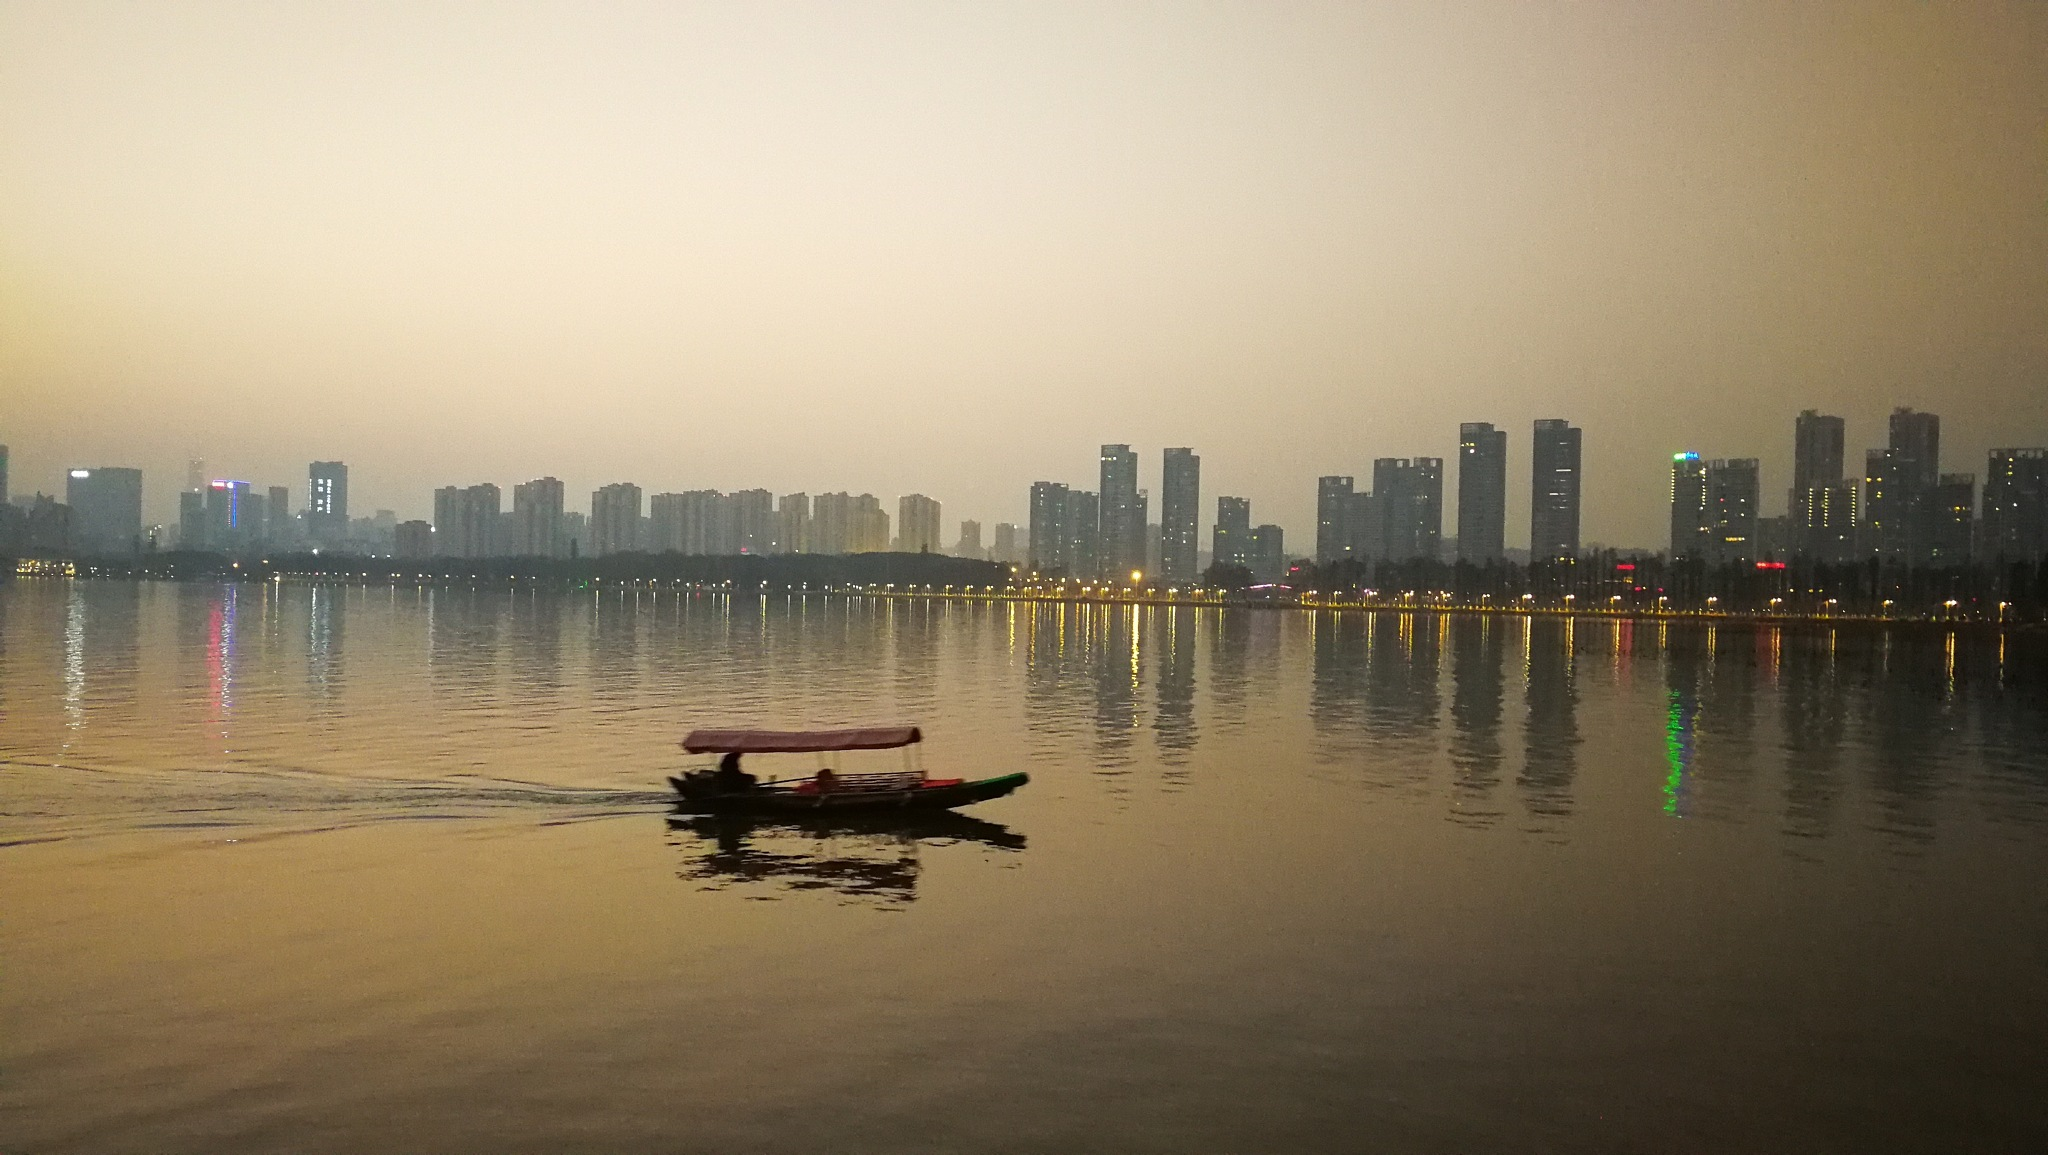 Sunset in Eastlake Wuchang by Studio89Fotos - 湖北武汉